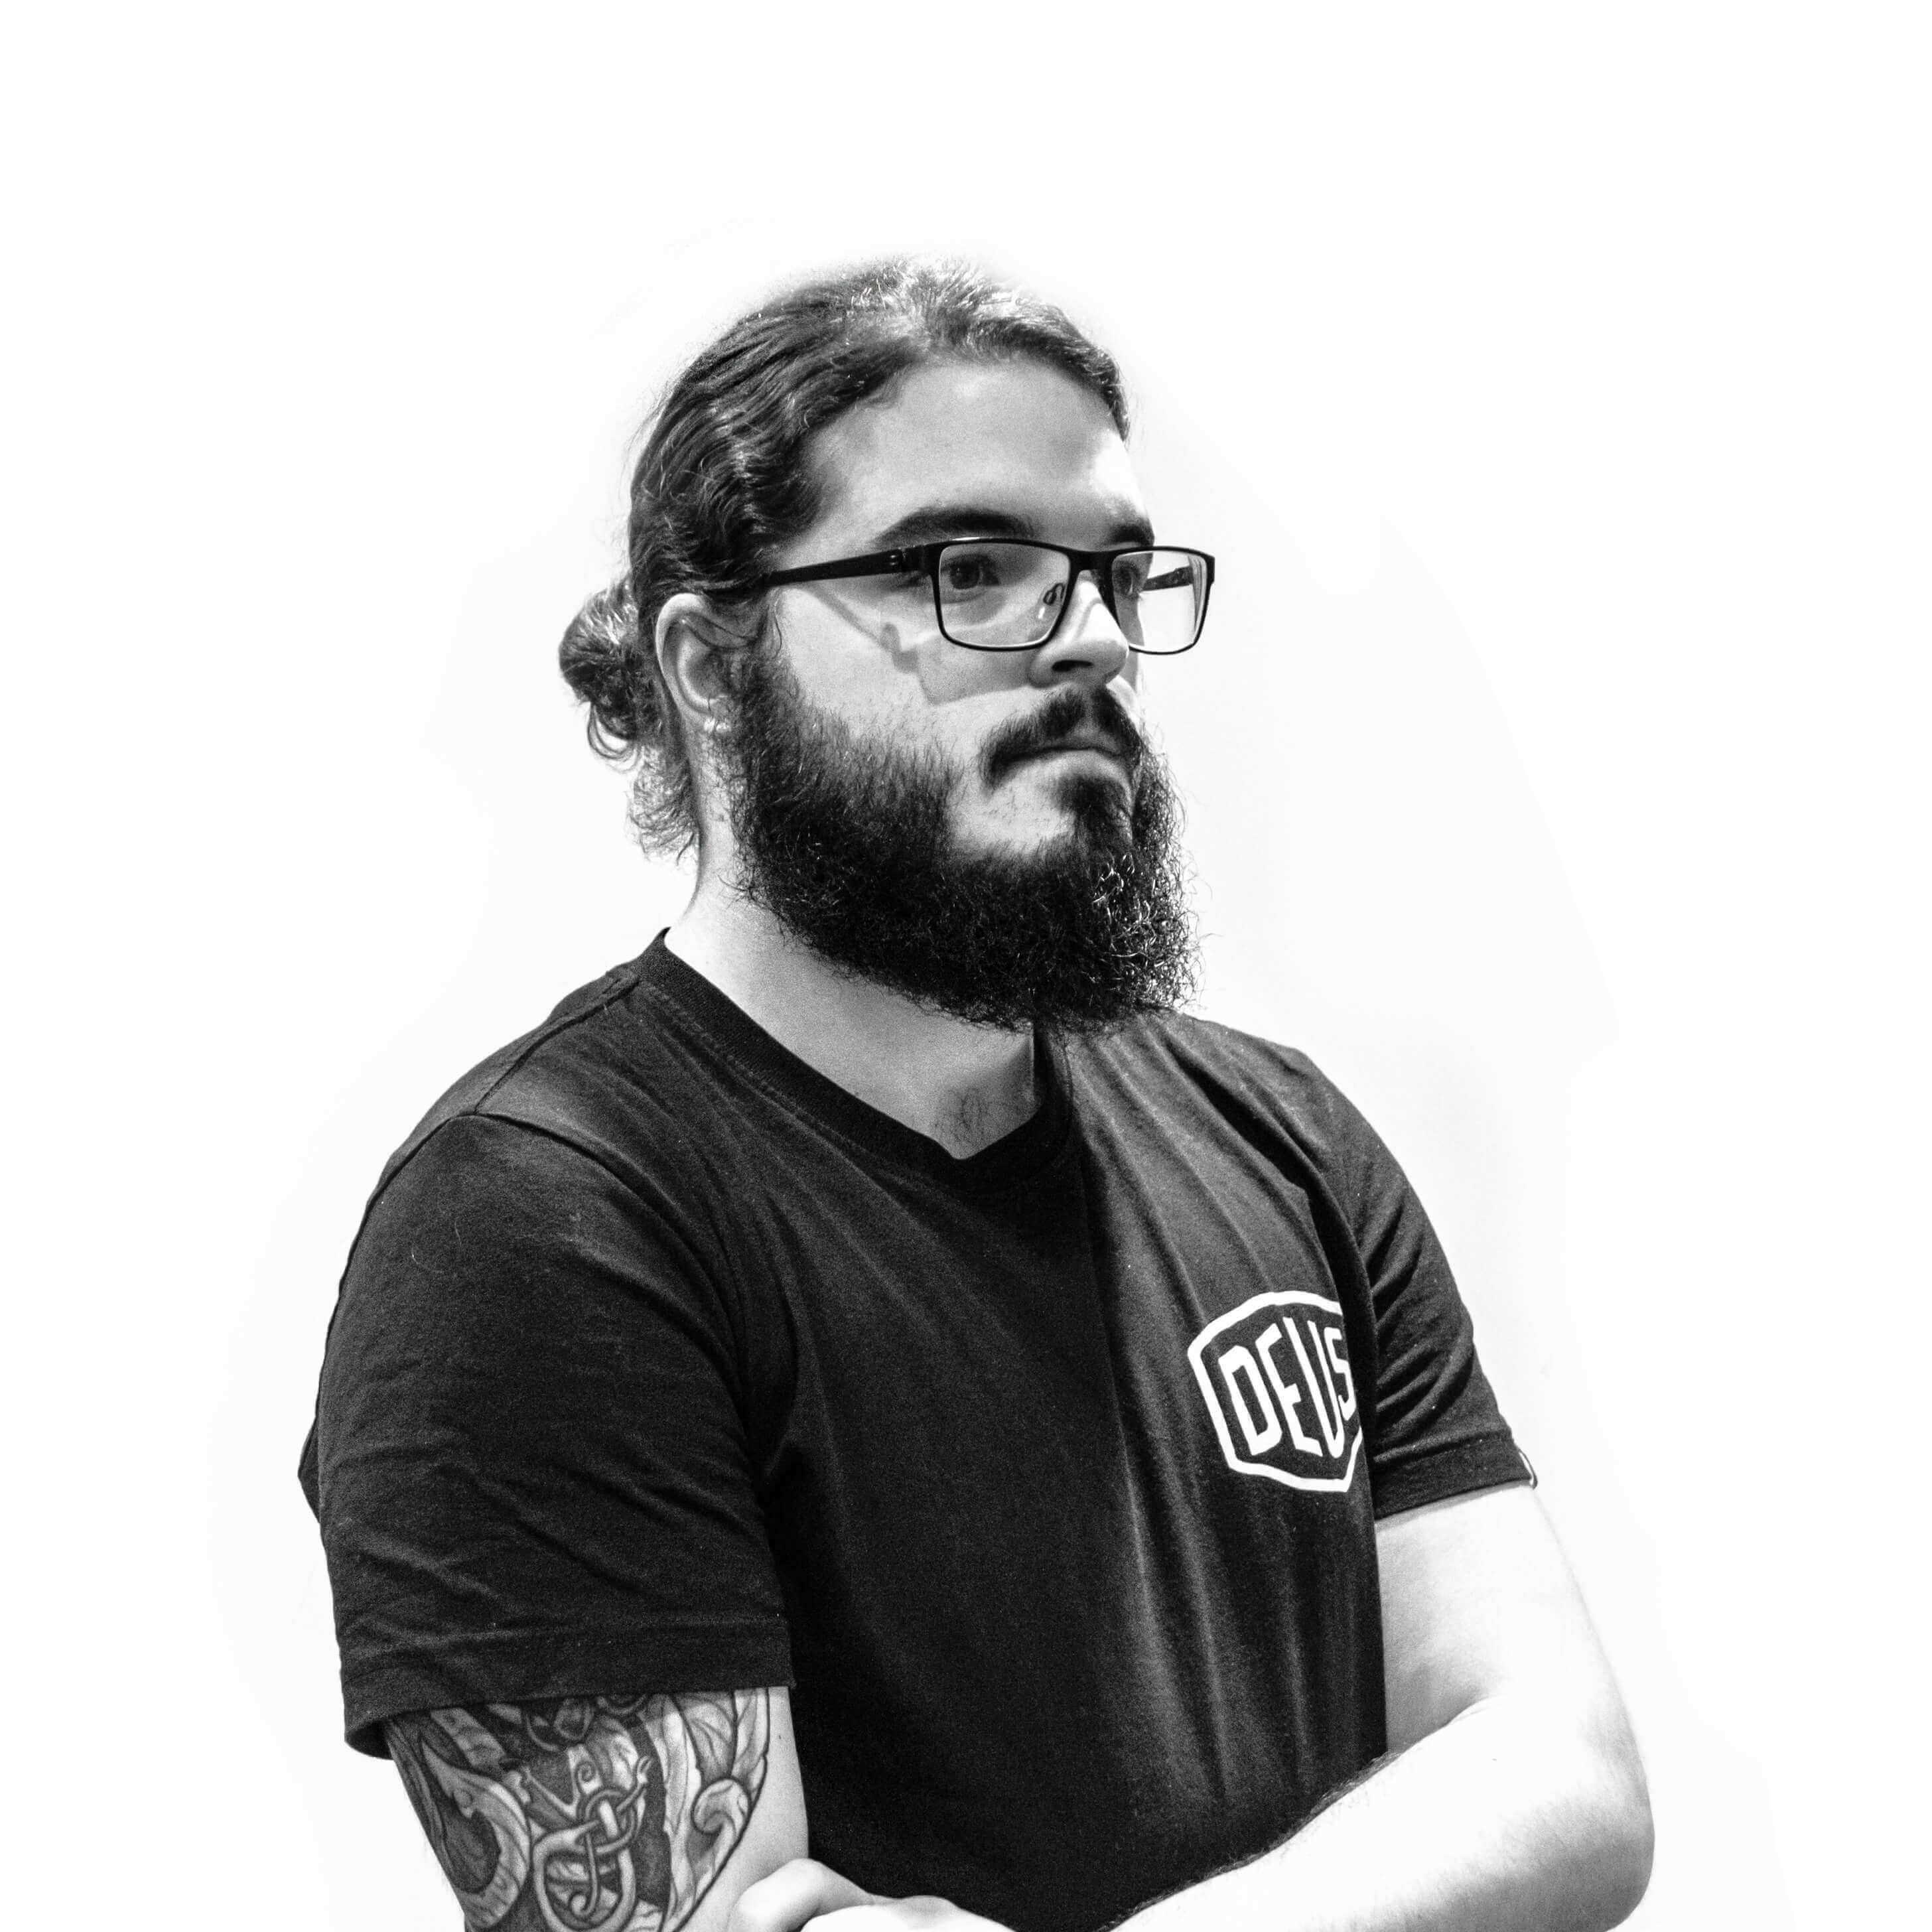 Luis Hermosilla